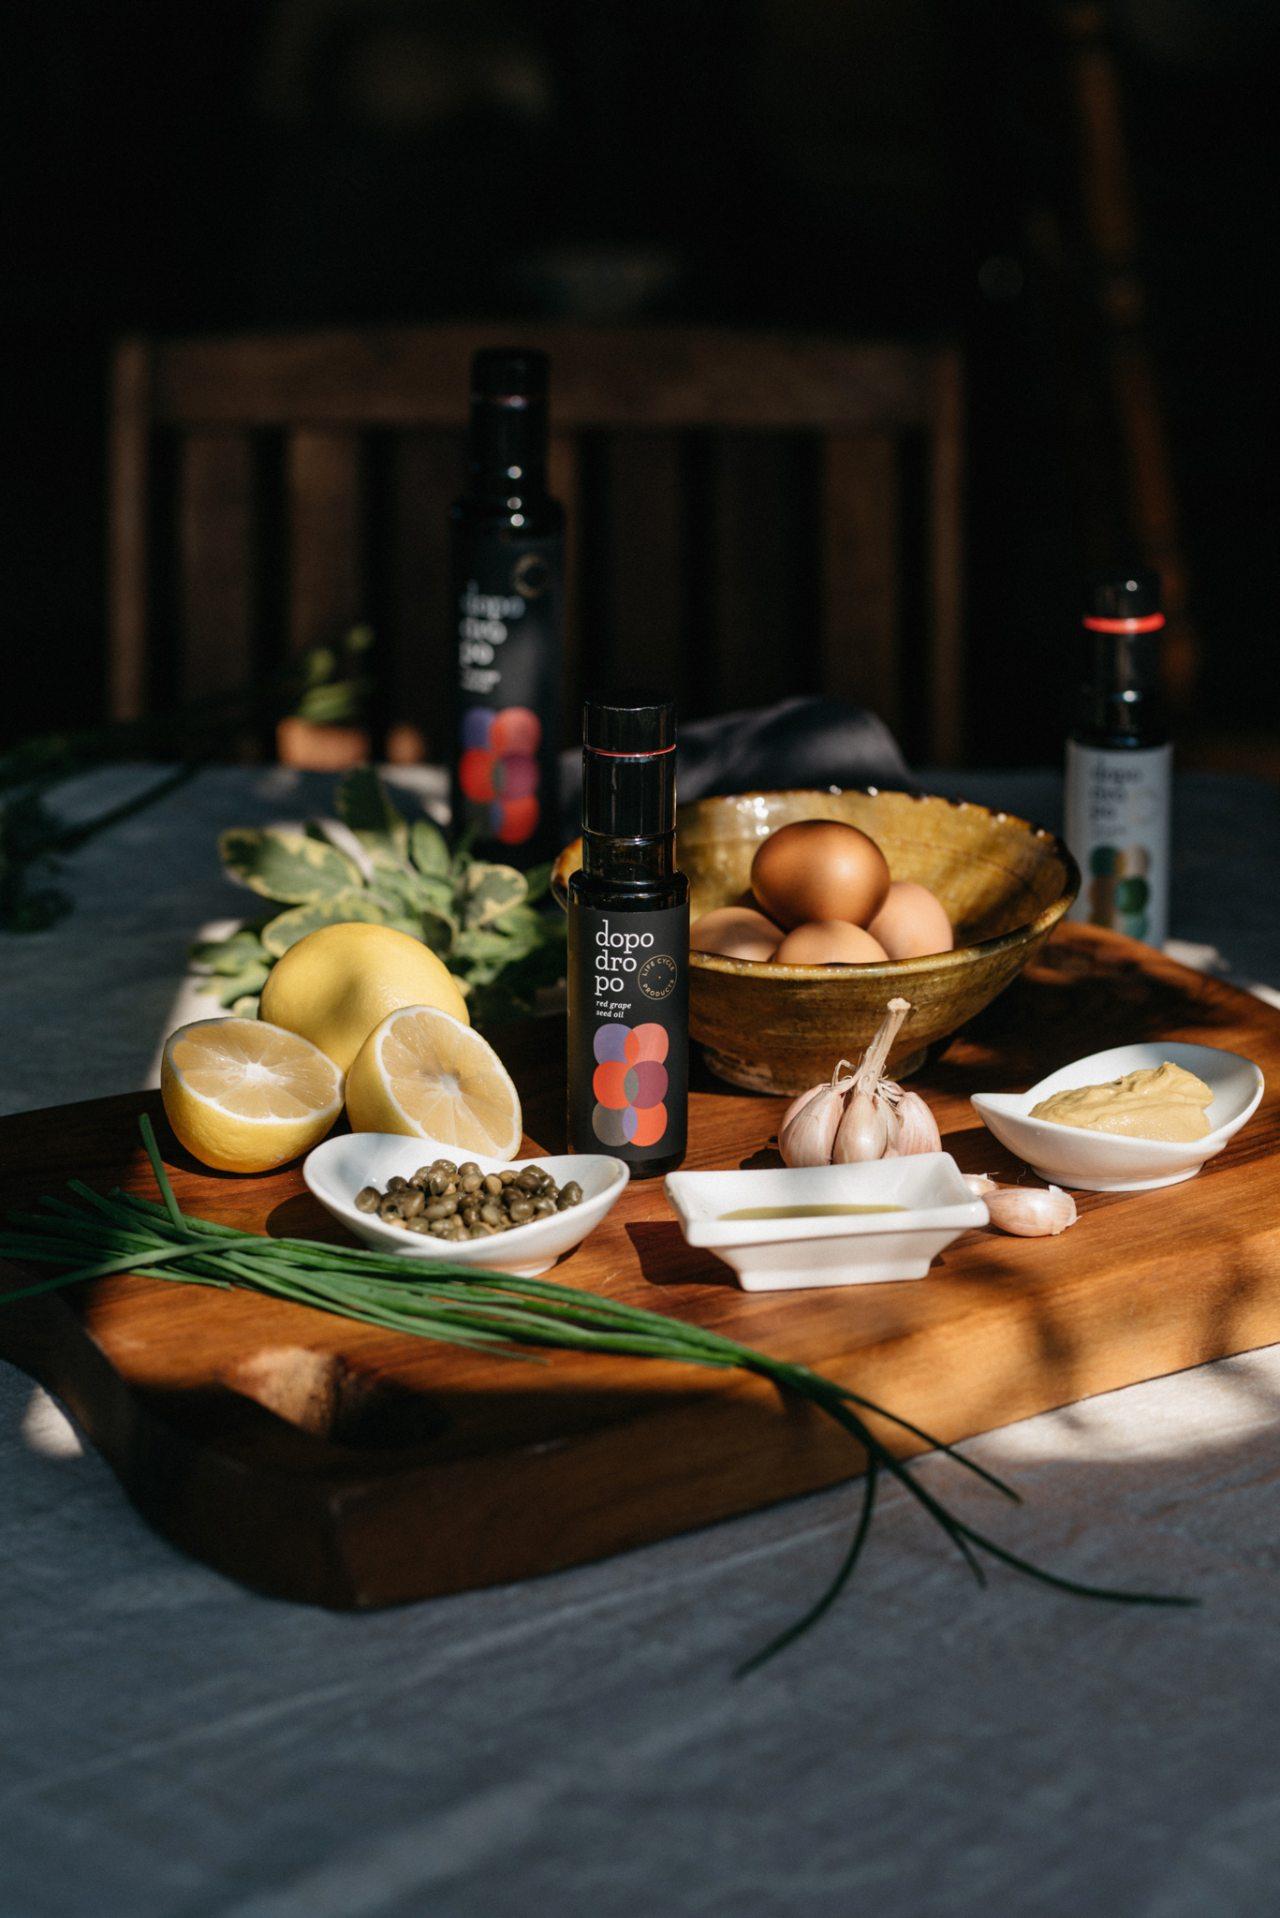 majoneza-i-prirodno-ulje-od-grožđa- dopo-dropo